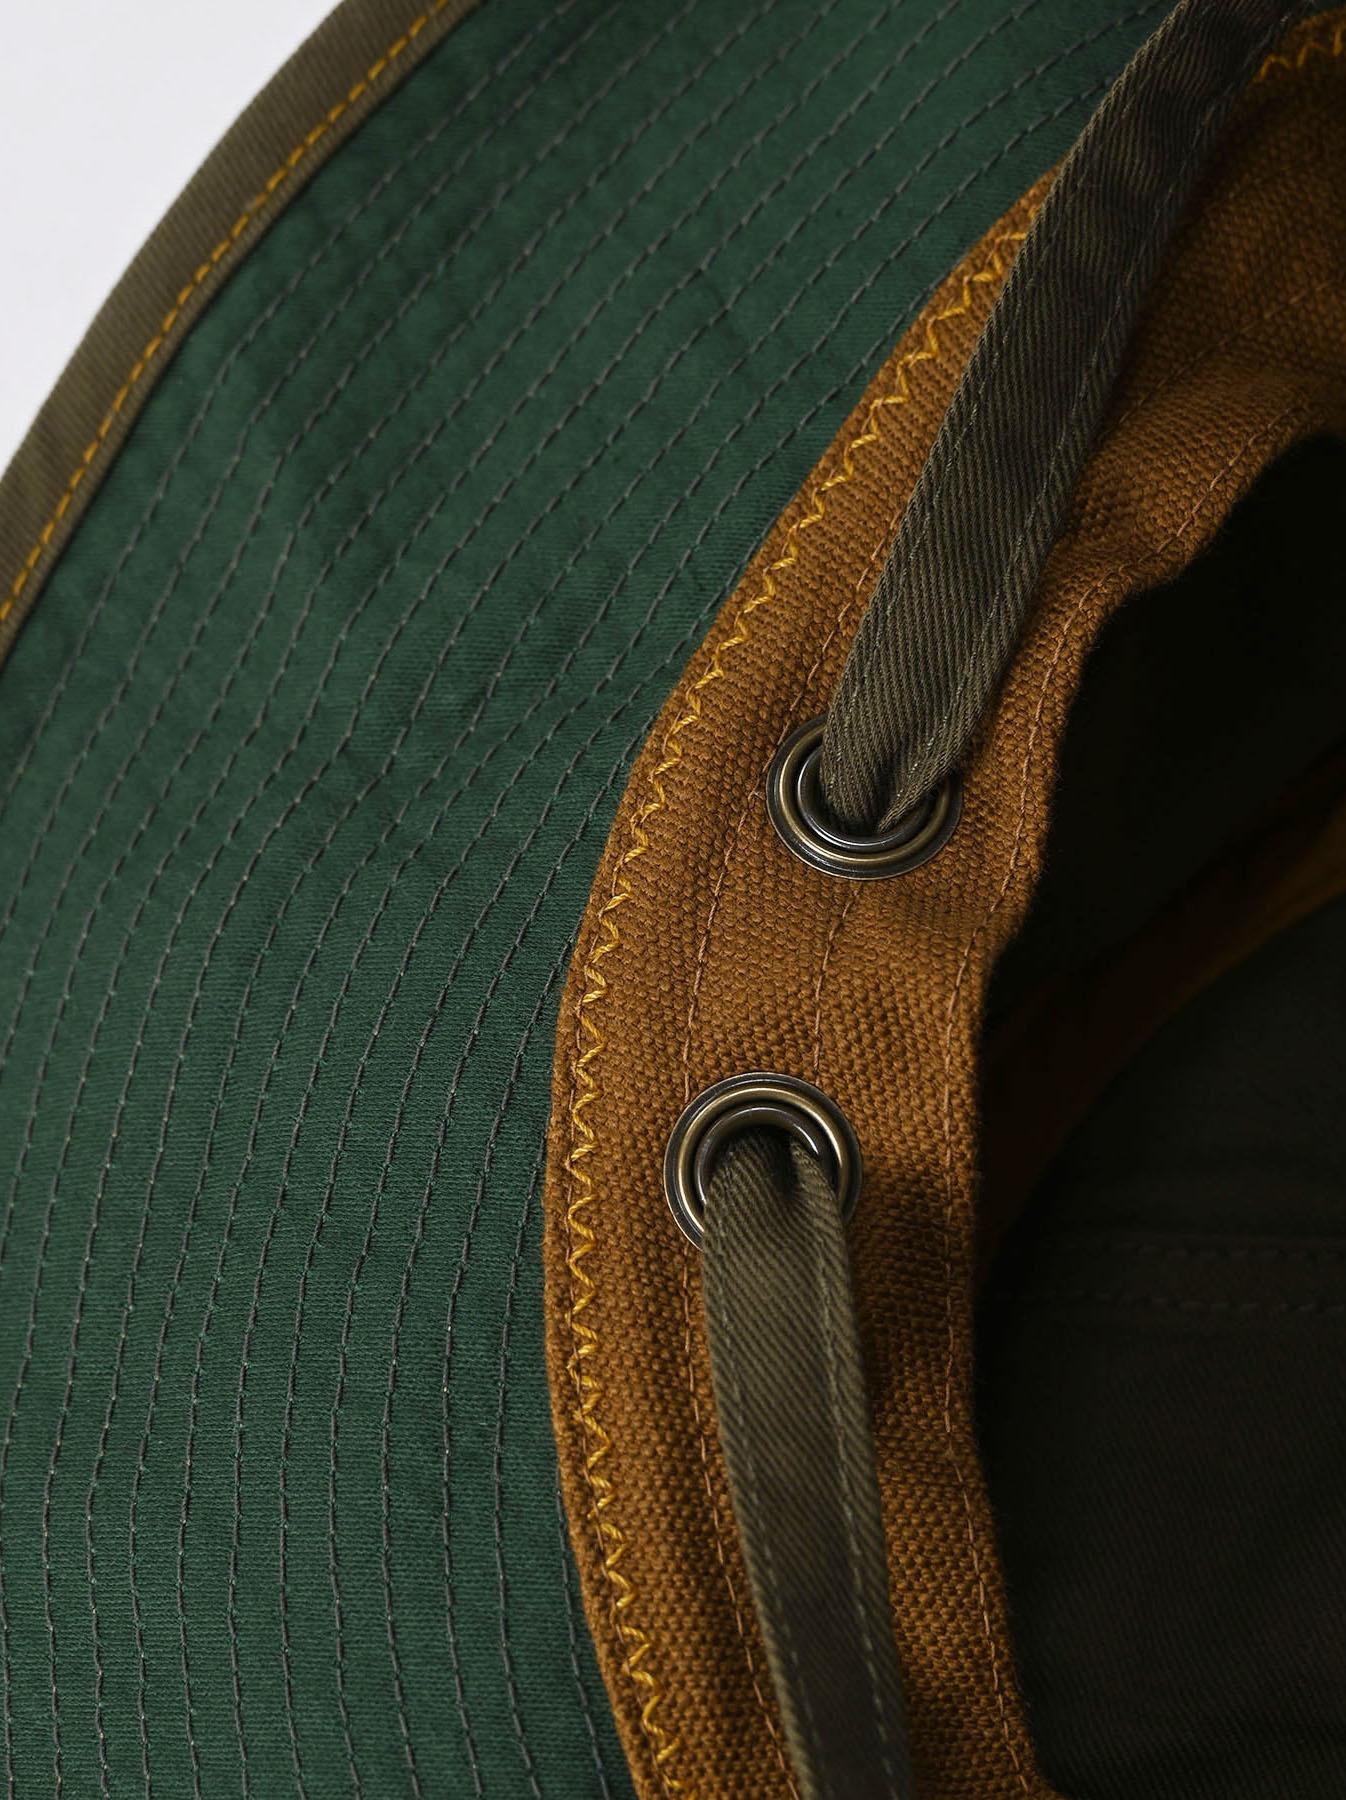 Okome Chino Sail Hat (0521)-10